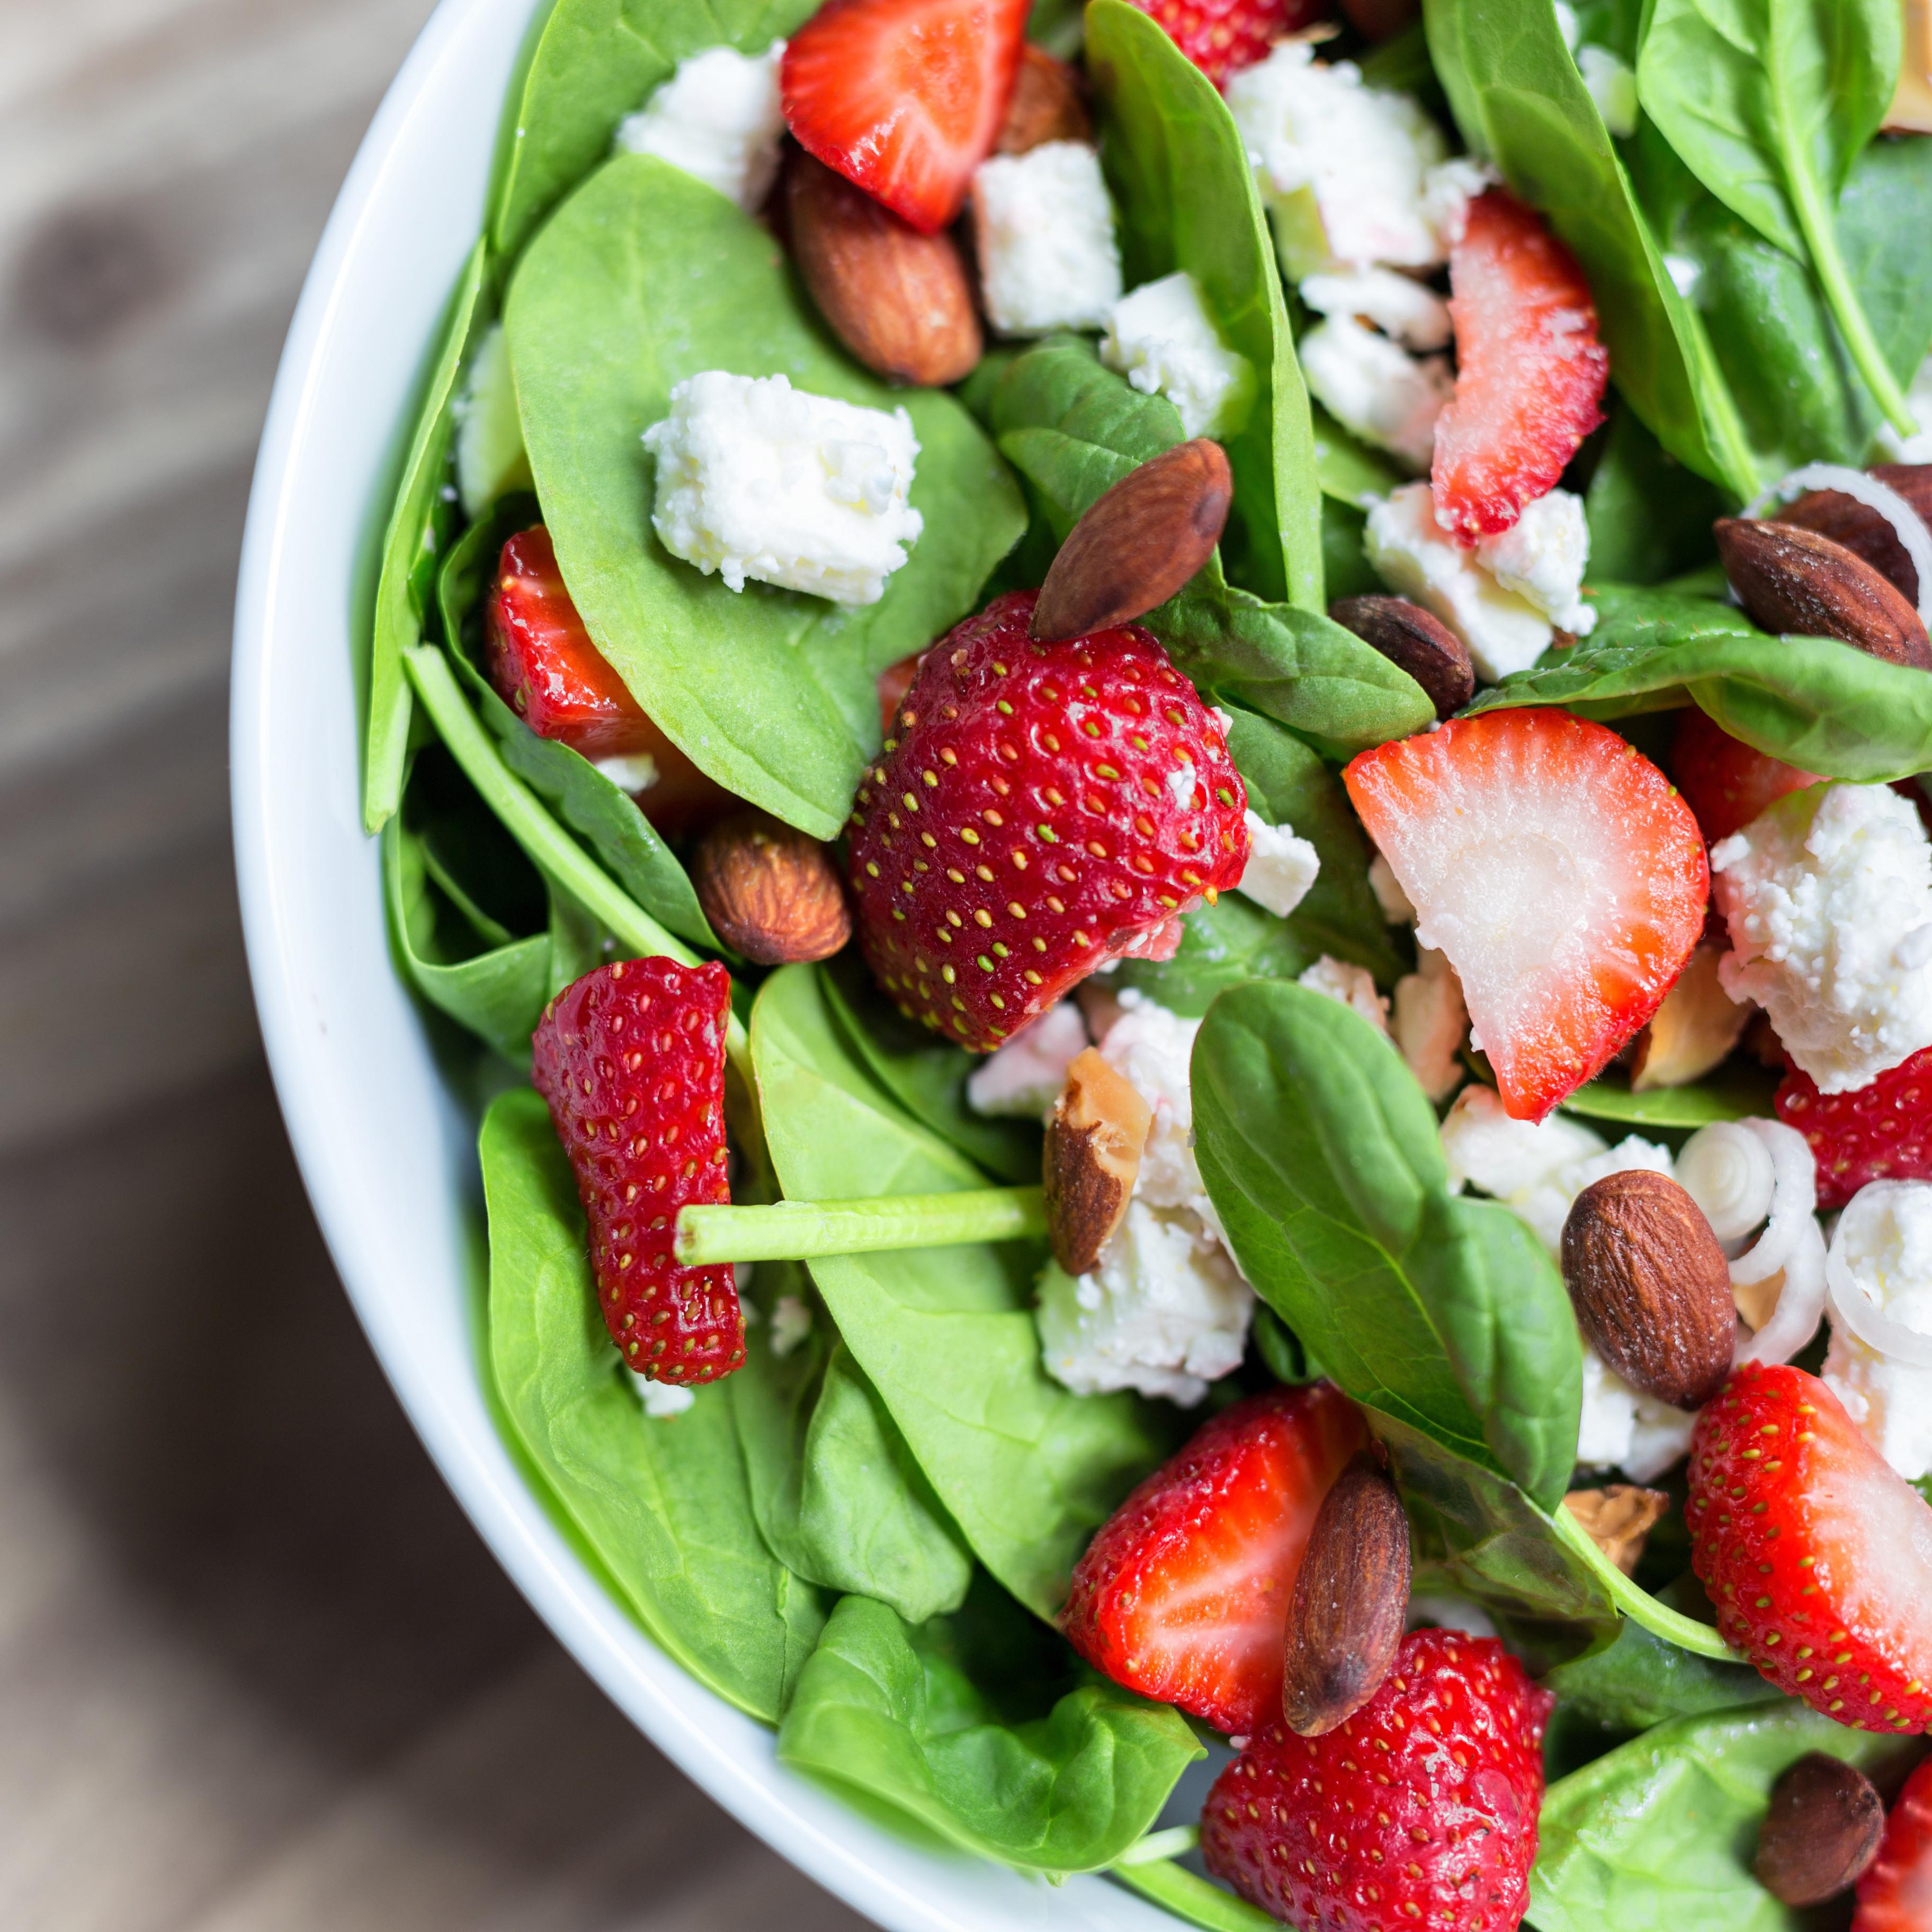 Heart Healthy Salad Dressings  3 Heart Healthy Salad Dressing Recipes